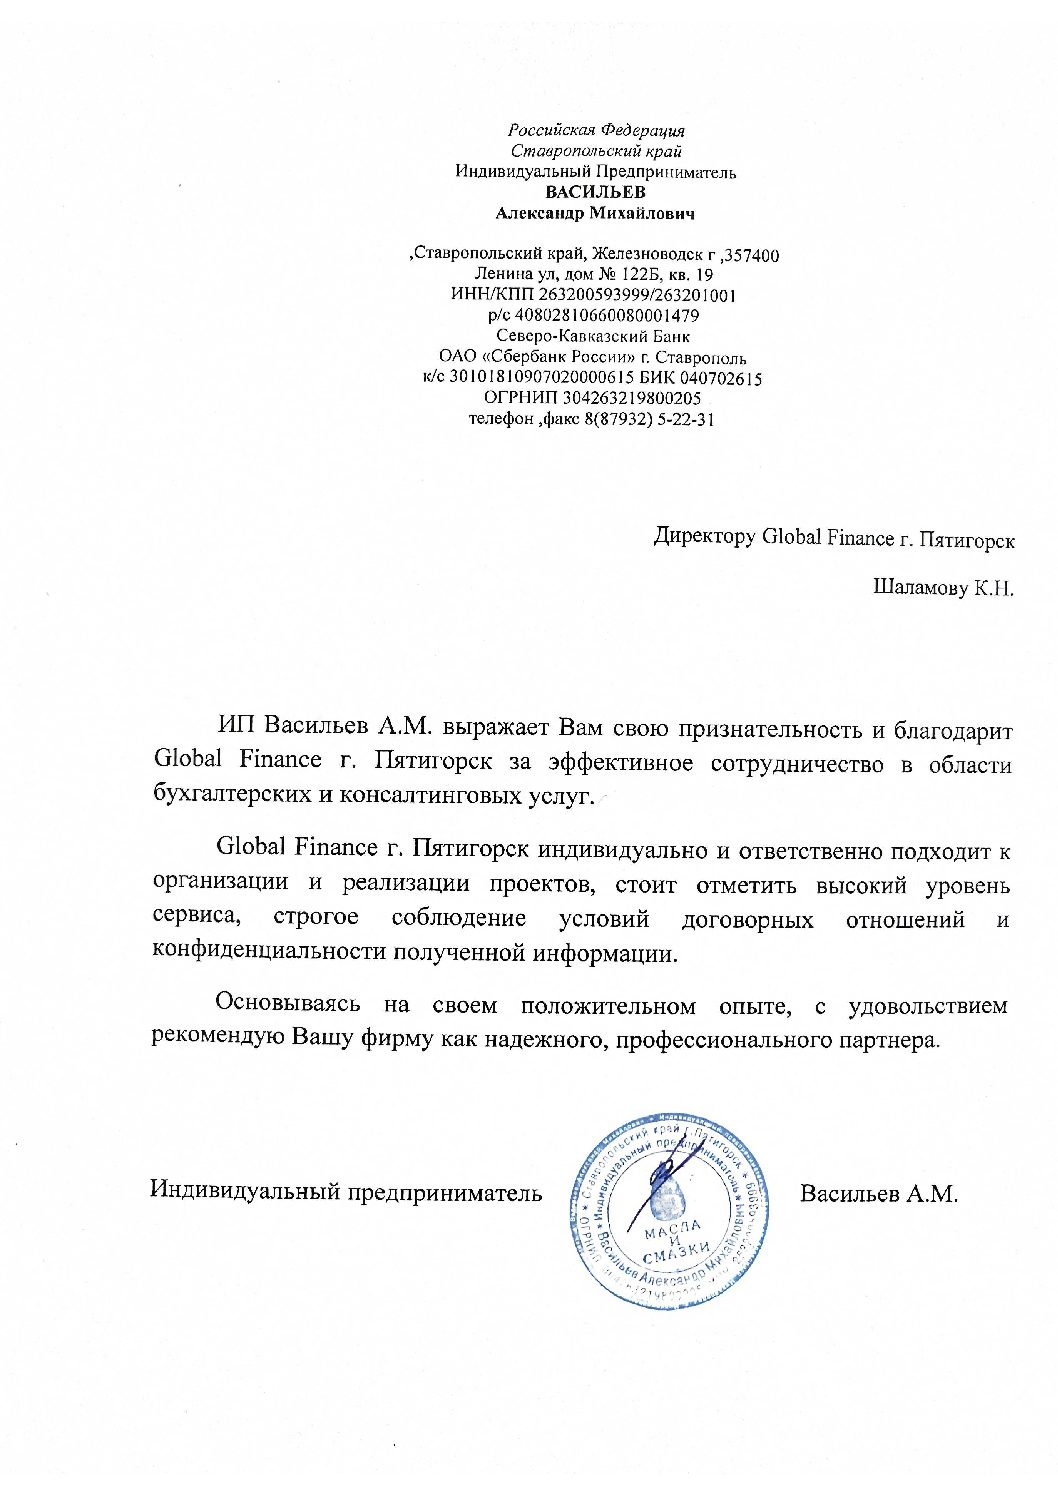 ИП Васильев А.М. (Автомаг-КМВ пос. Иноземцево)